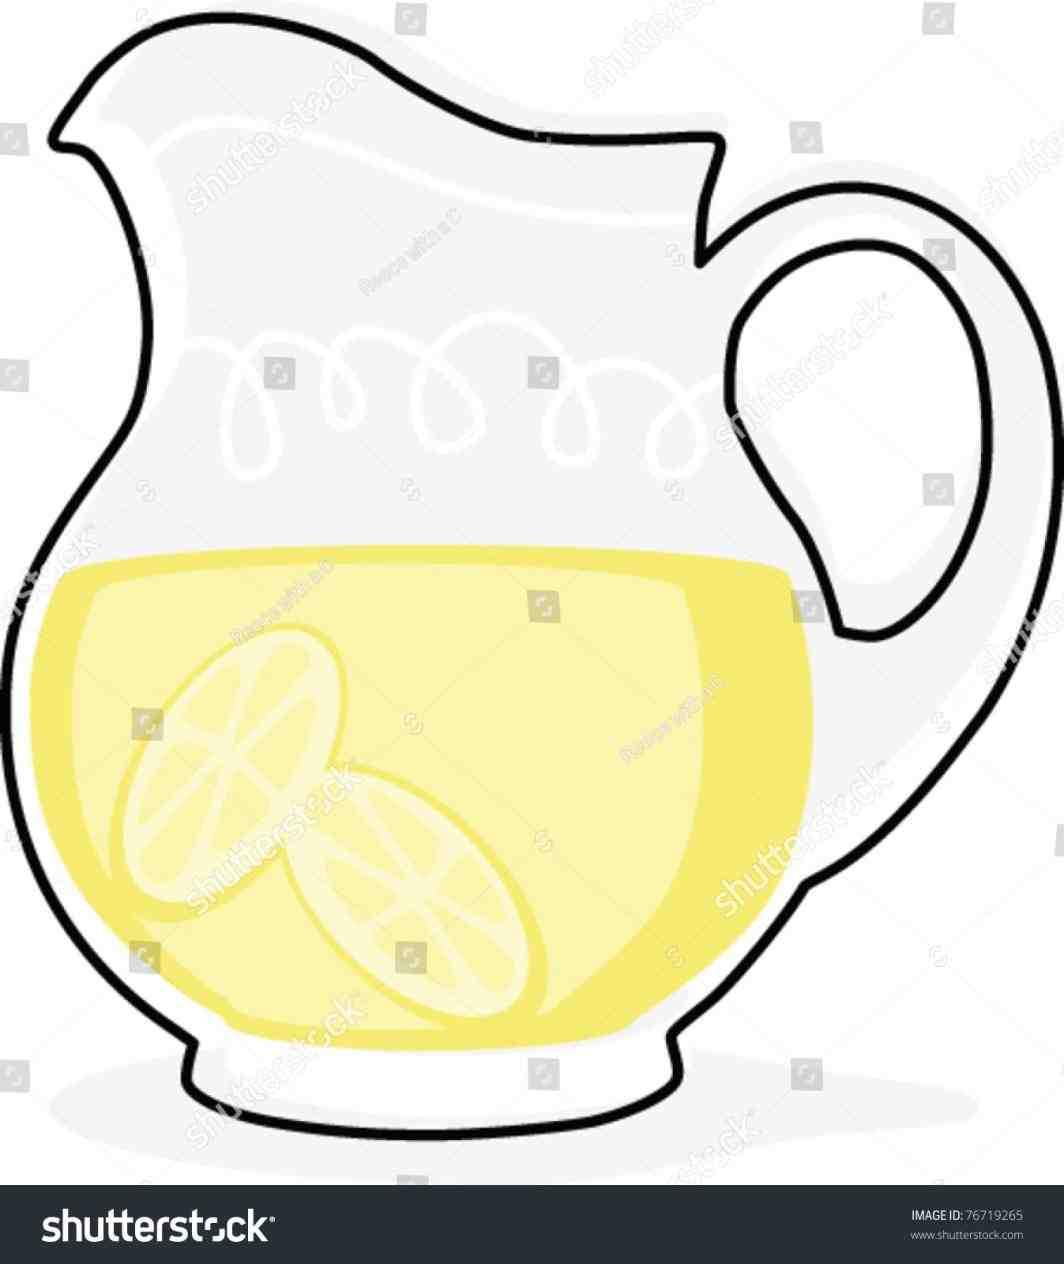 1064x1264 Lemonade Pitcher Drawing